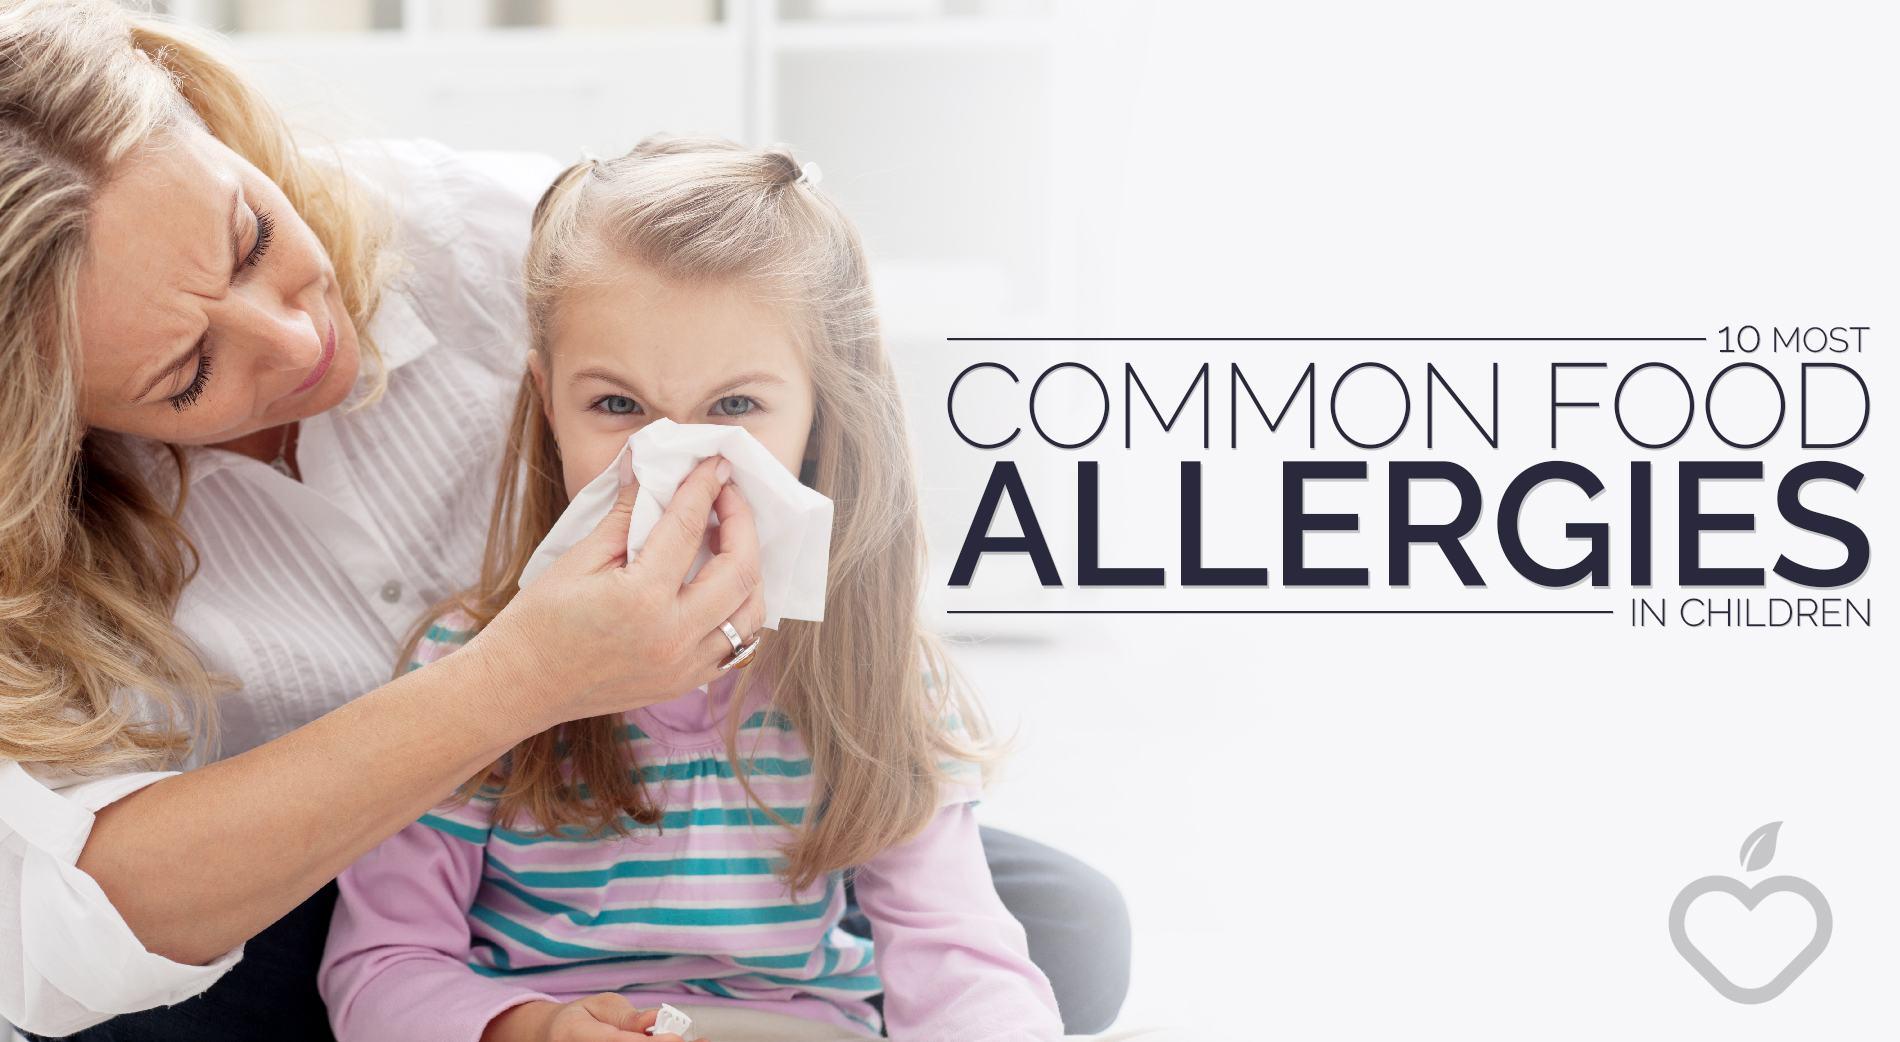 Most Common Cat Food Allergies